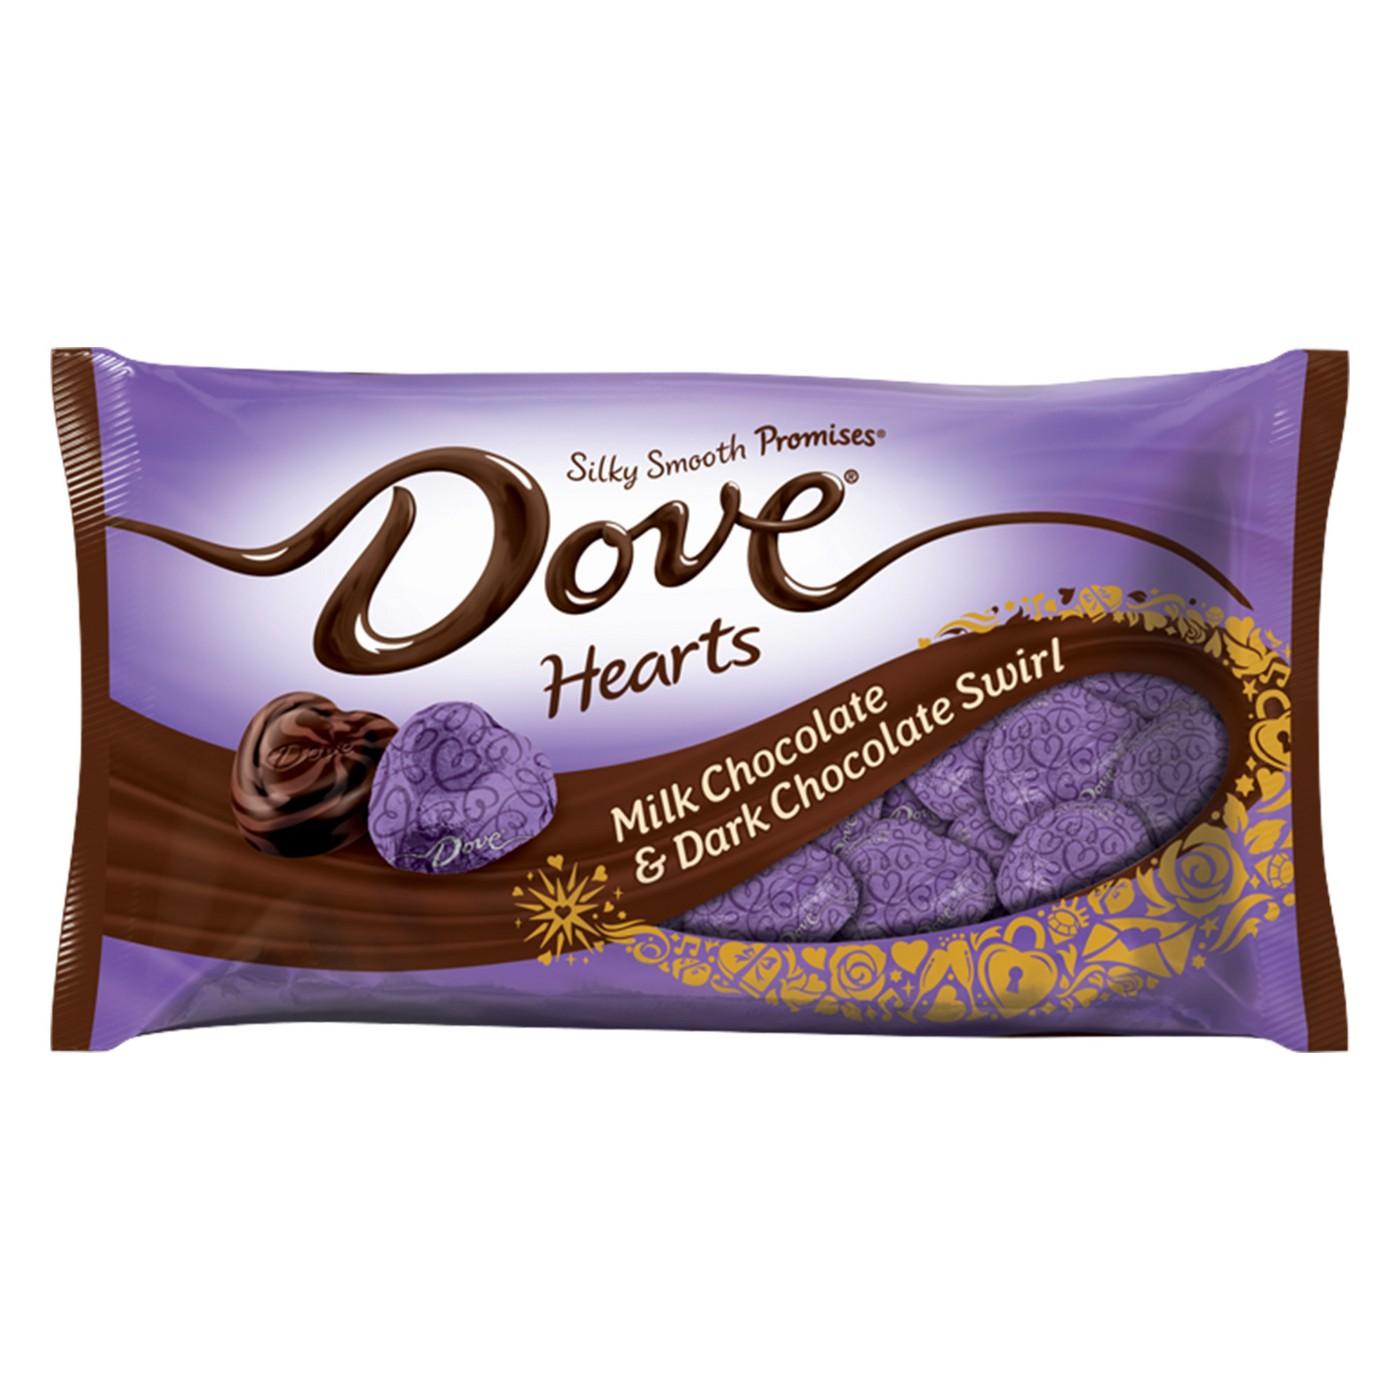 Target Cartwheel: 30% off on Dove Valentine's Day Chocolates. Free pickup. $2.58